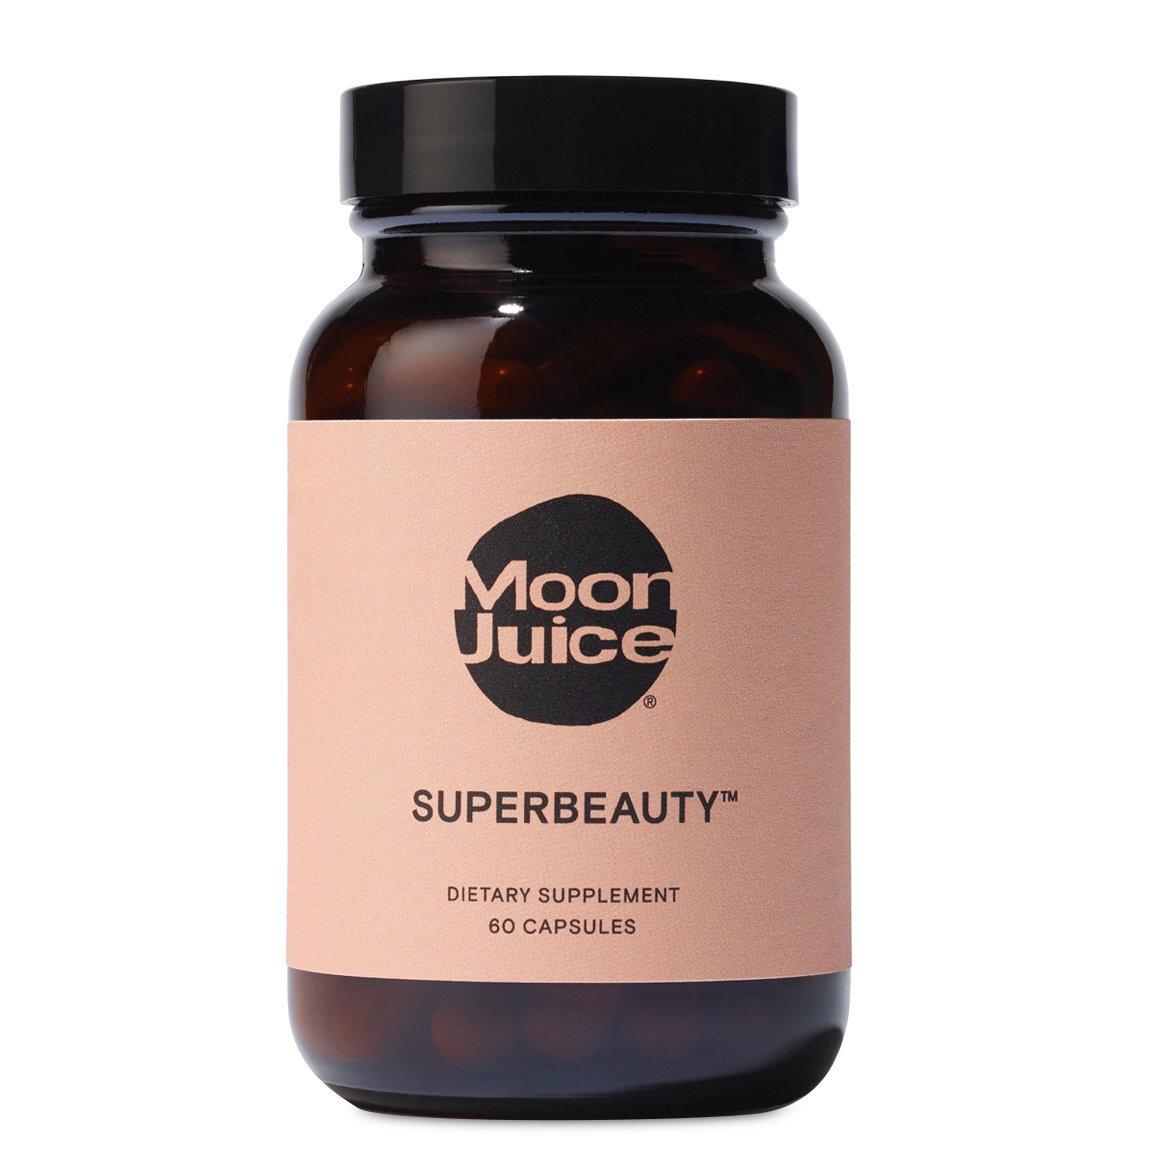 Moon Juice SuperBeauty product swatch.